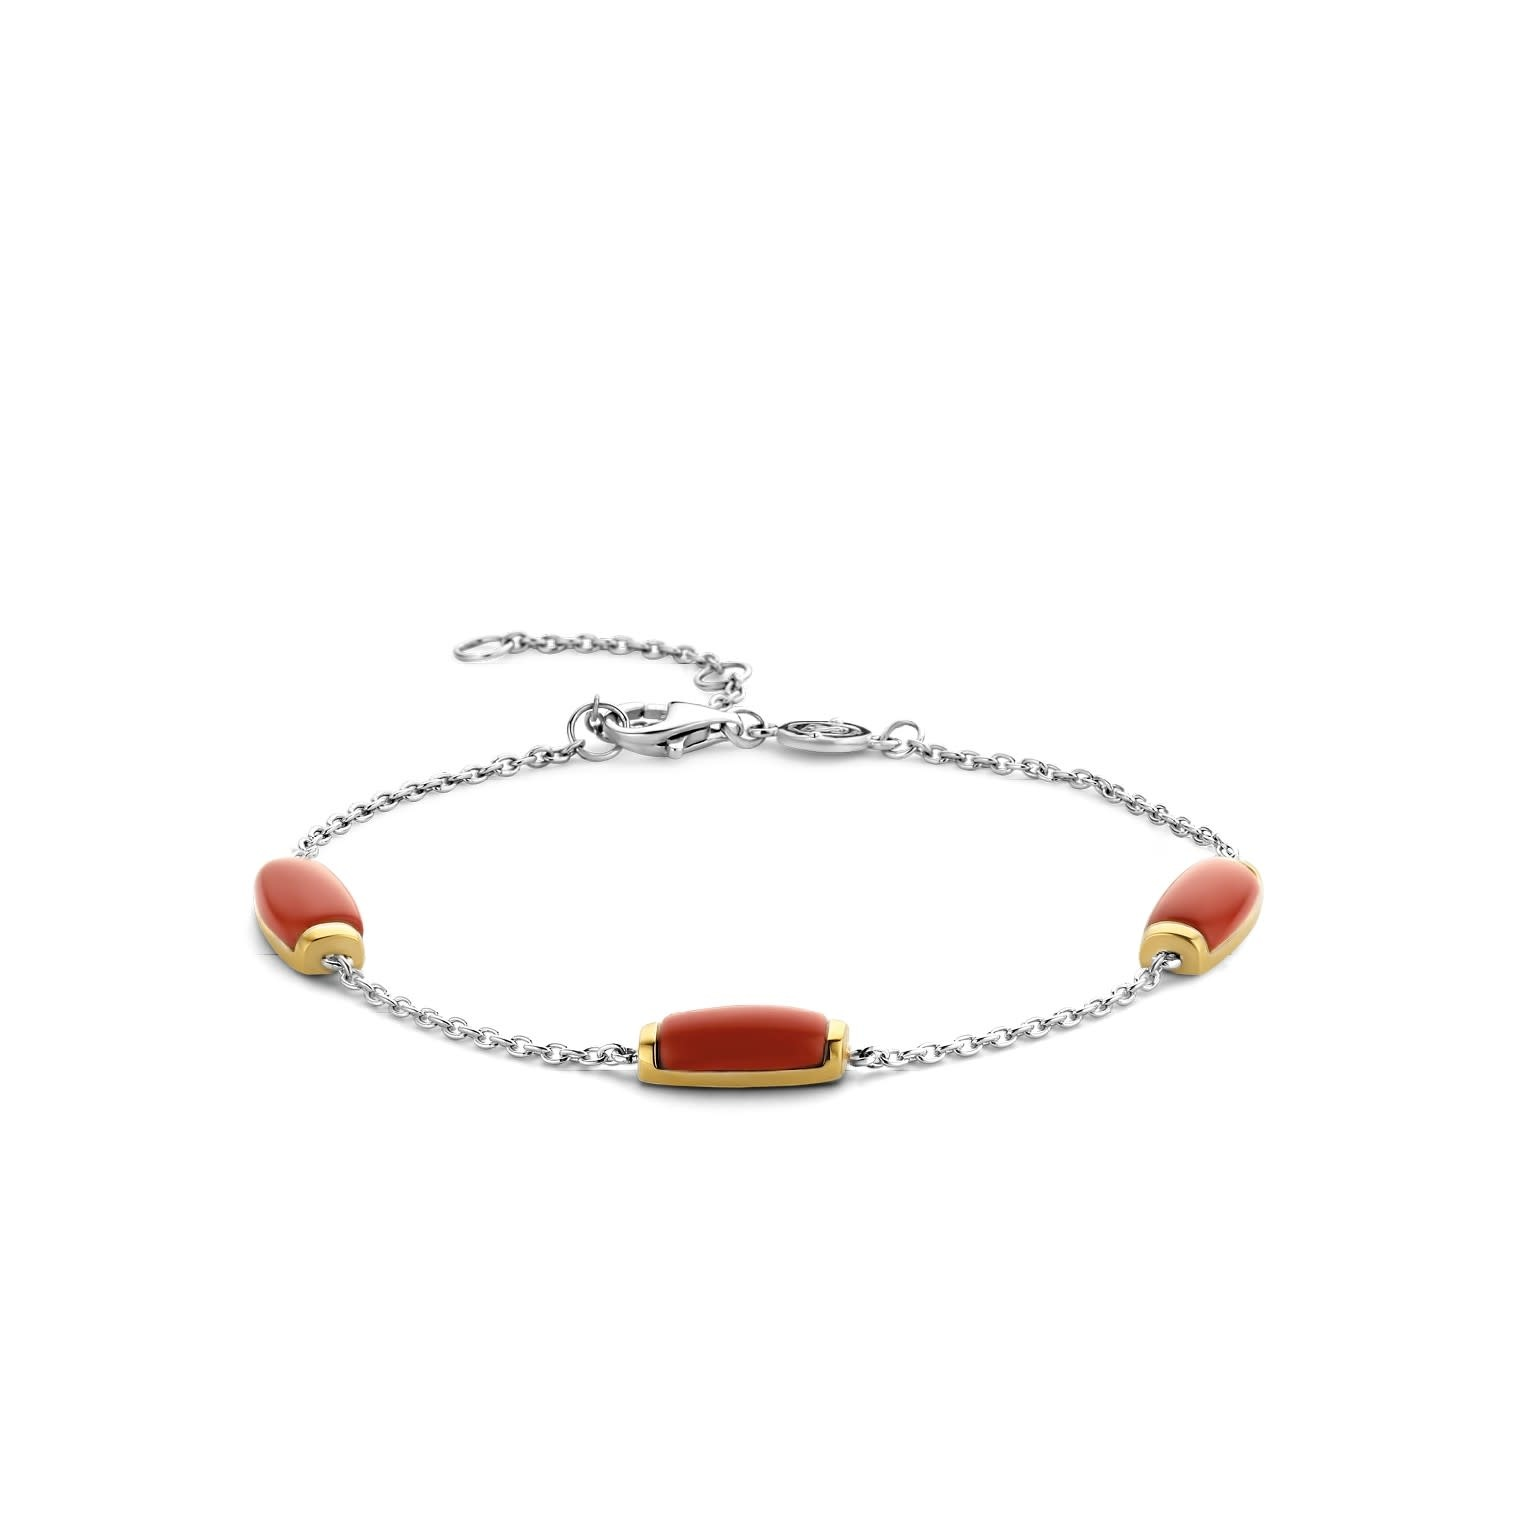 TI SENTO - Milano Bracelet 2930CR-1